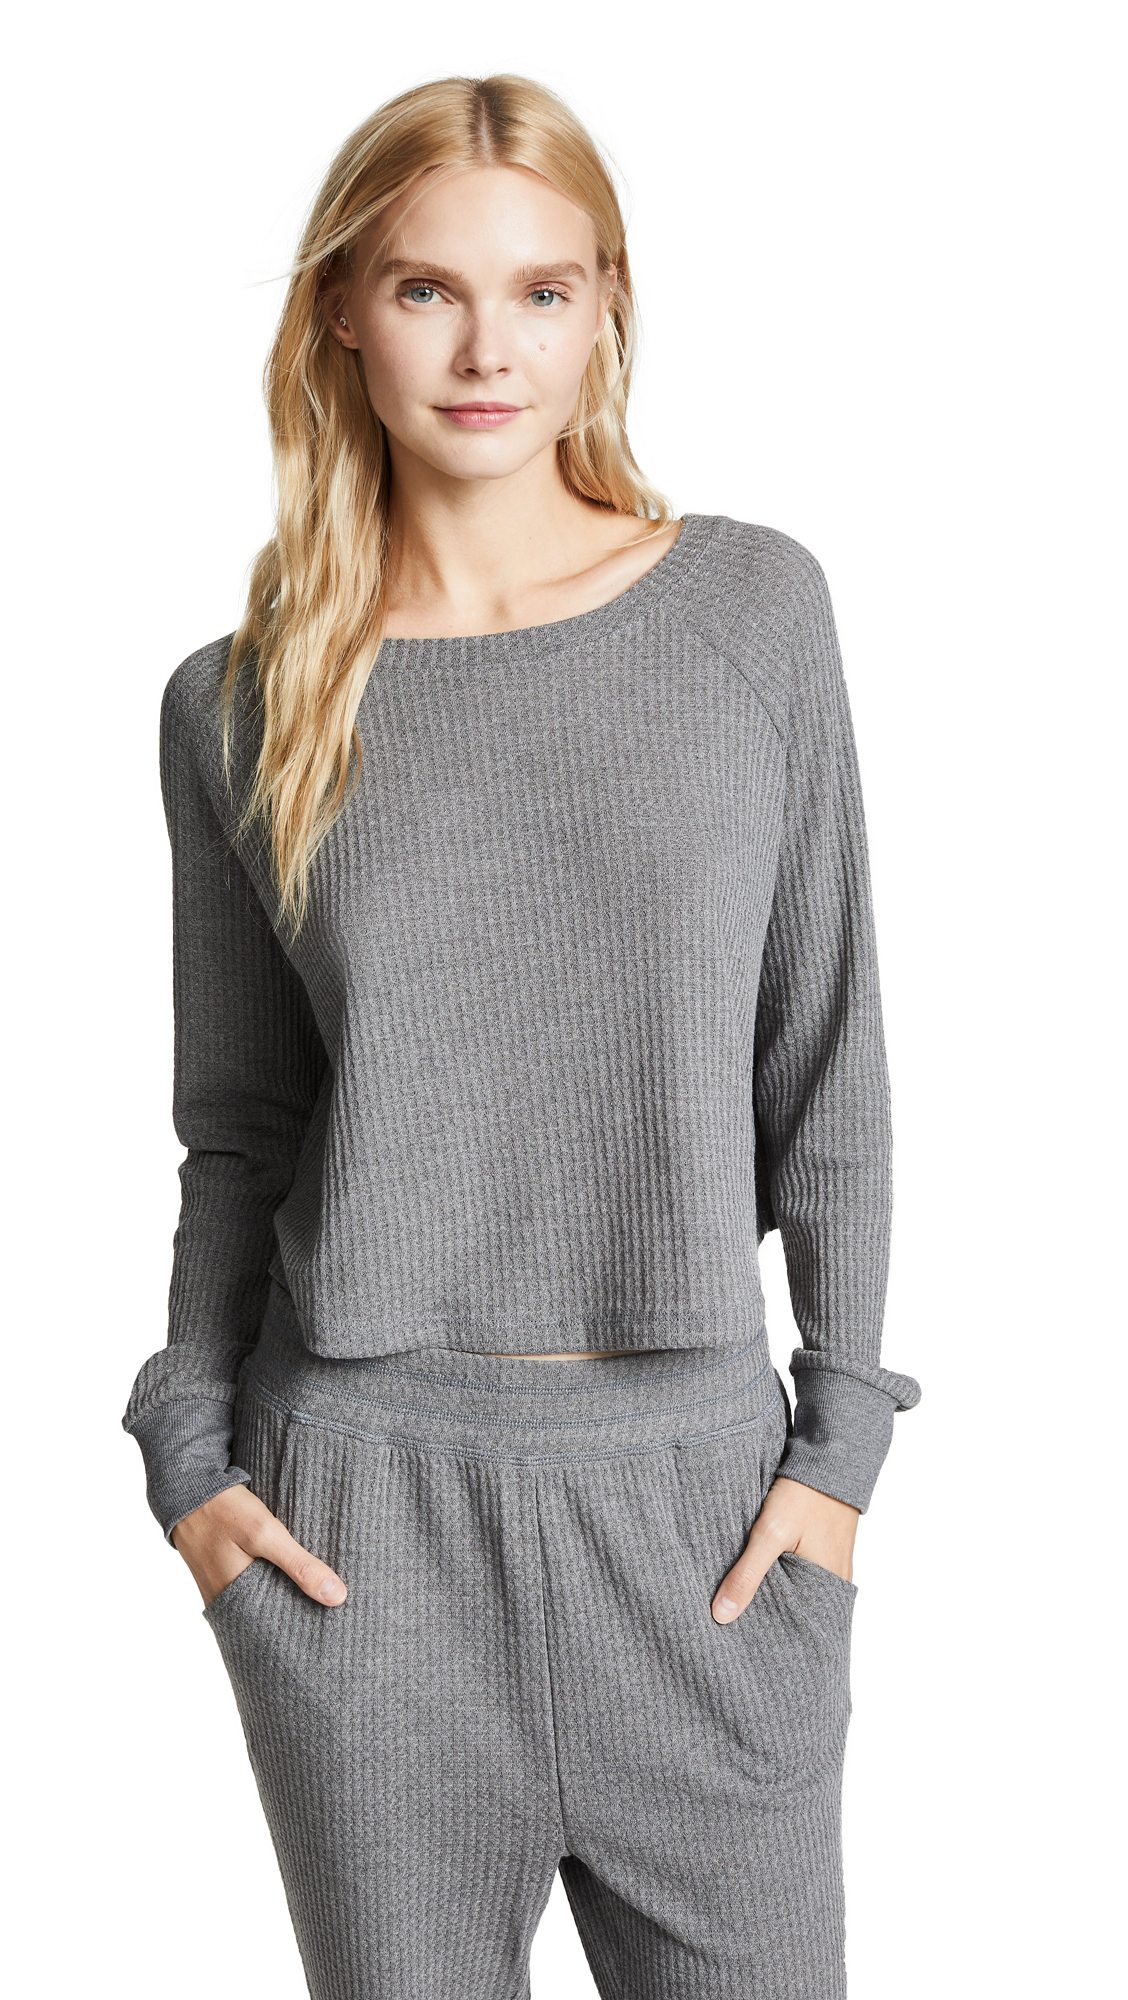 Honeydew Intimates Sneak Peek Waffle Knit Crop Sweatshirt